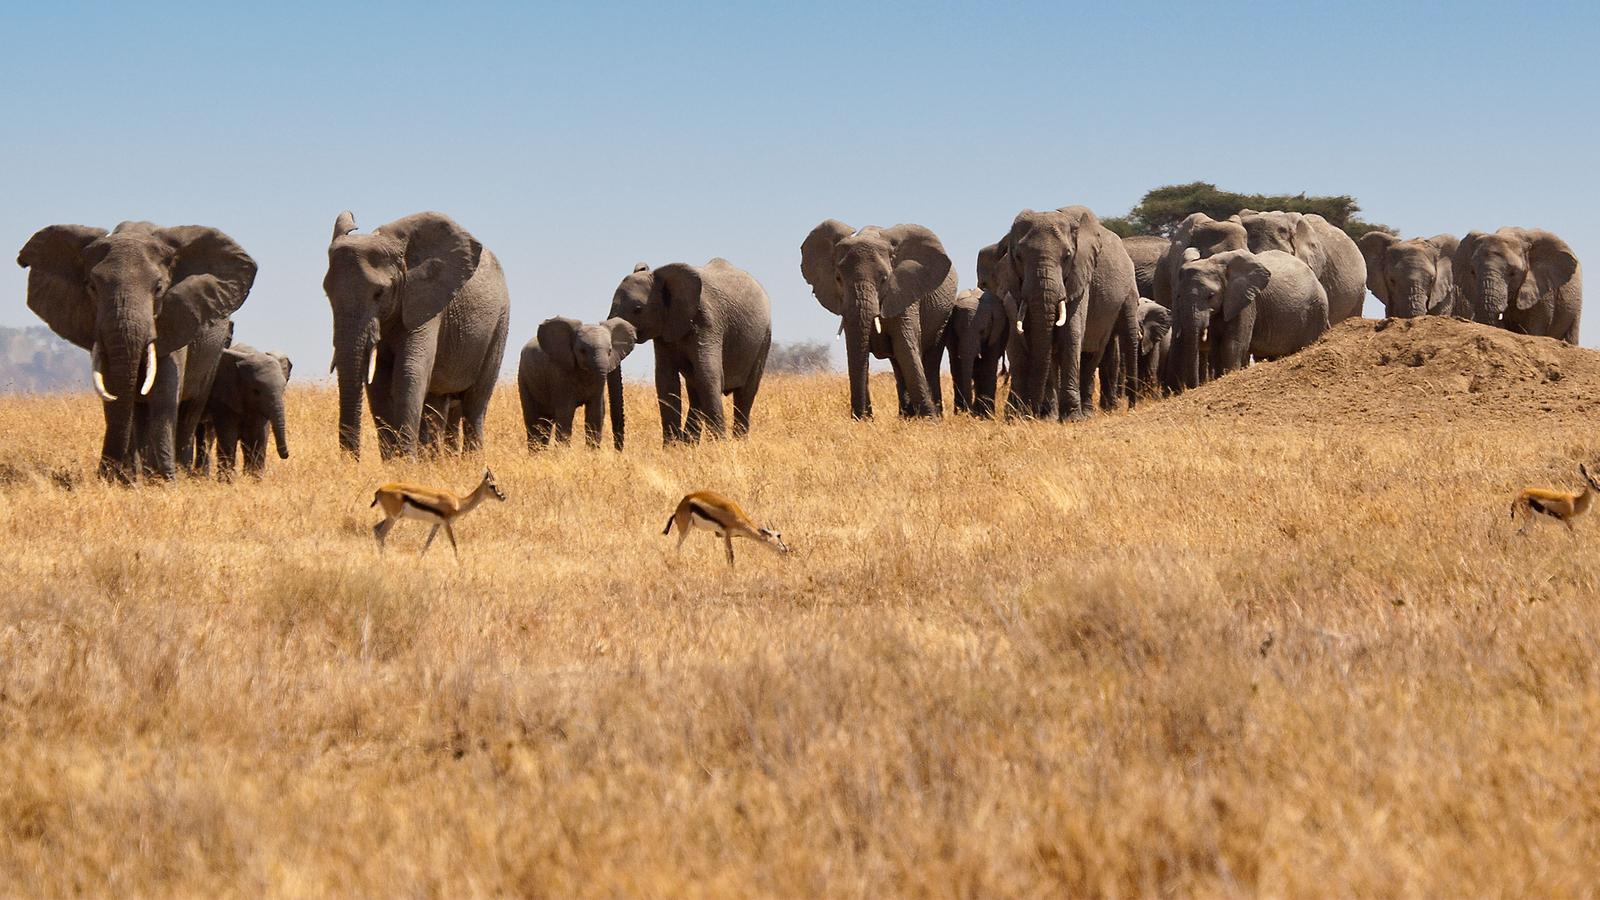 Victoria Falls Hd Wallpaper Falls Beaches Amp Serengeti Adventure Southbound In